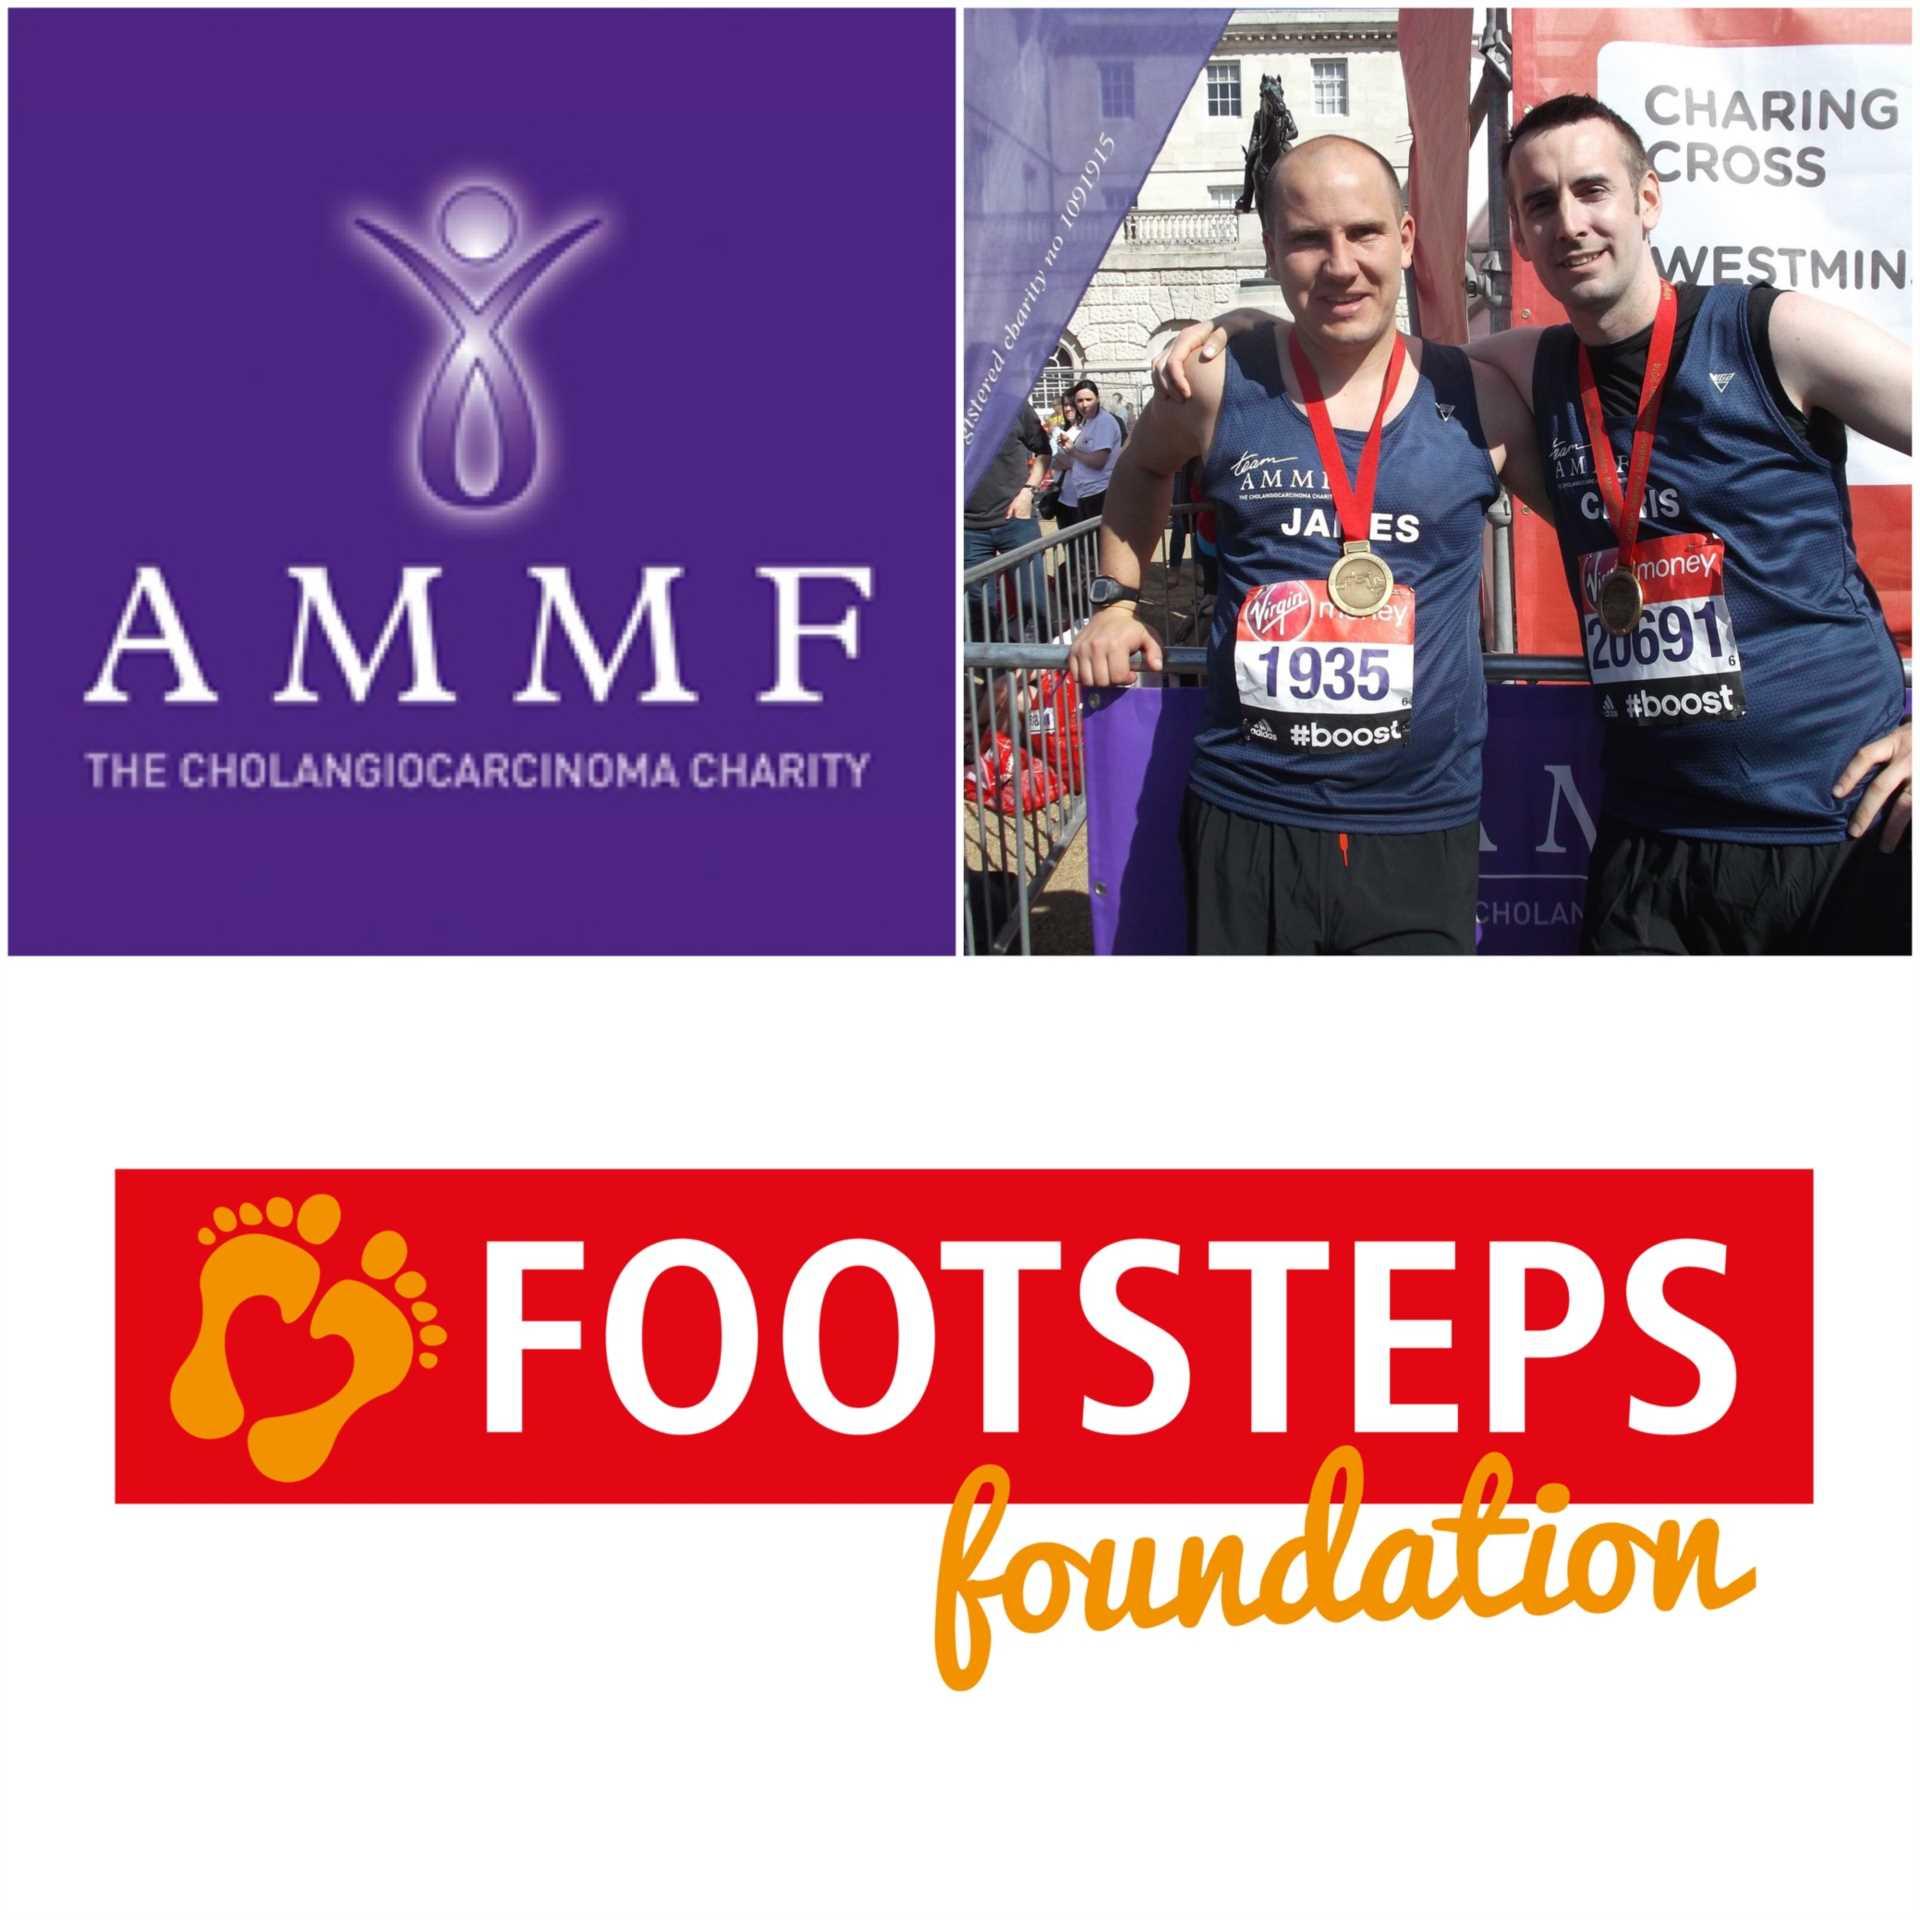 James Gesner to run London Marathon 2017